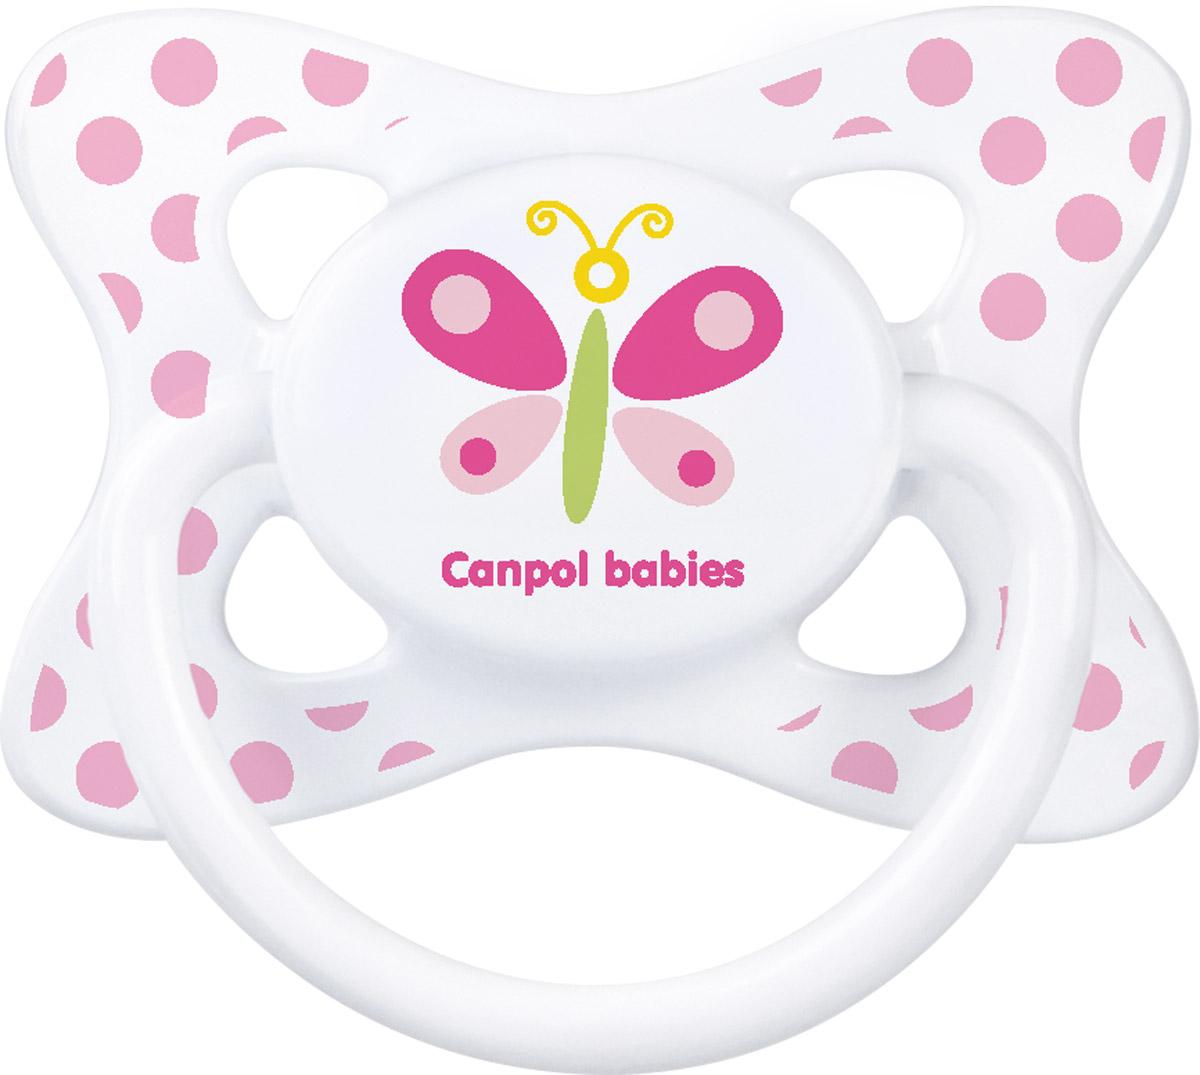 Canpol Babies Пустышка латексная Бабочка от 6 до 18 месяцев canpol babies пустышка латексная space от 6 до 18 месяцев цвет фиолетовый